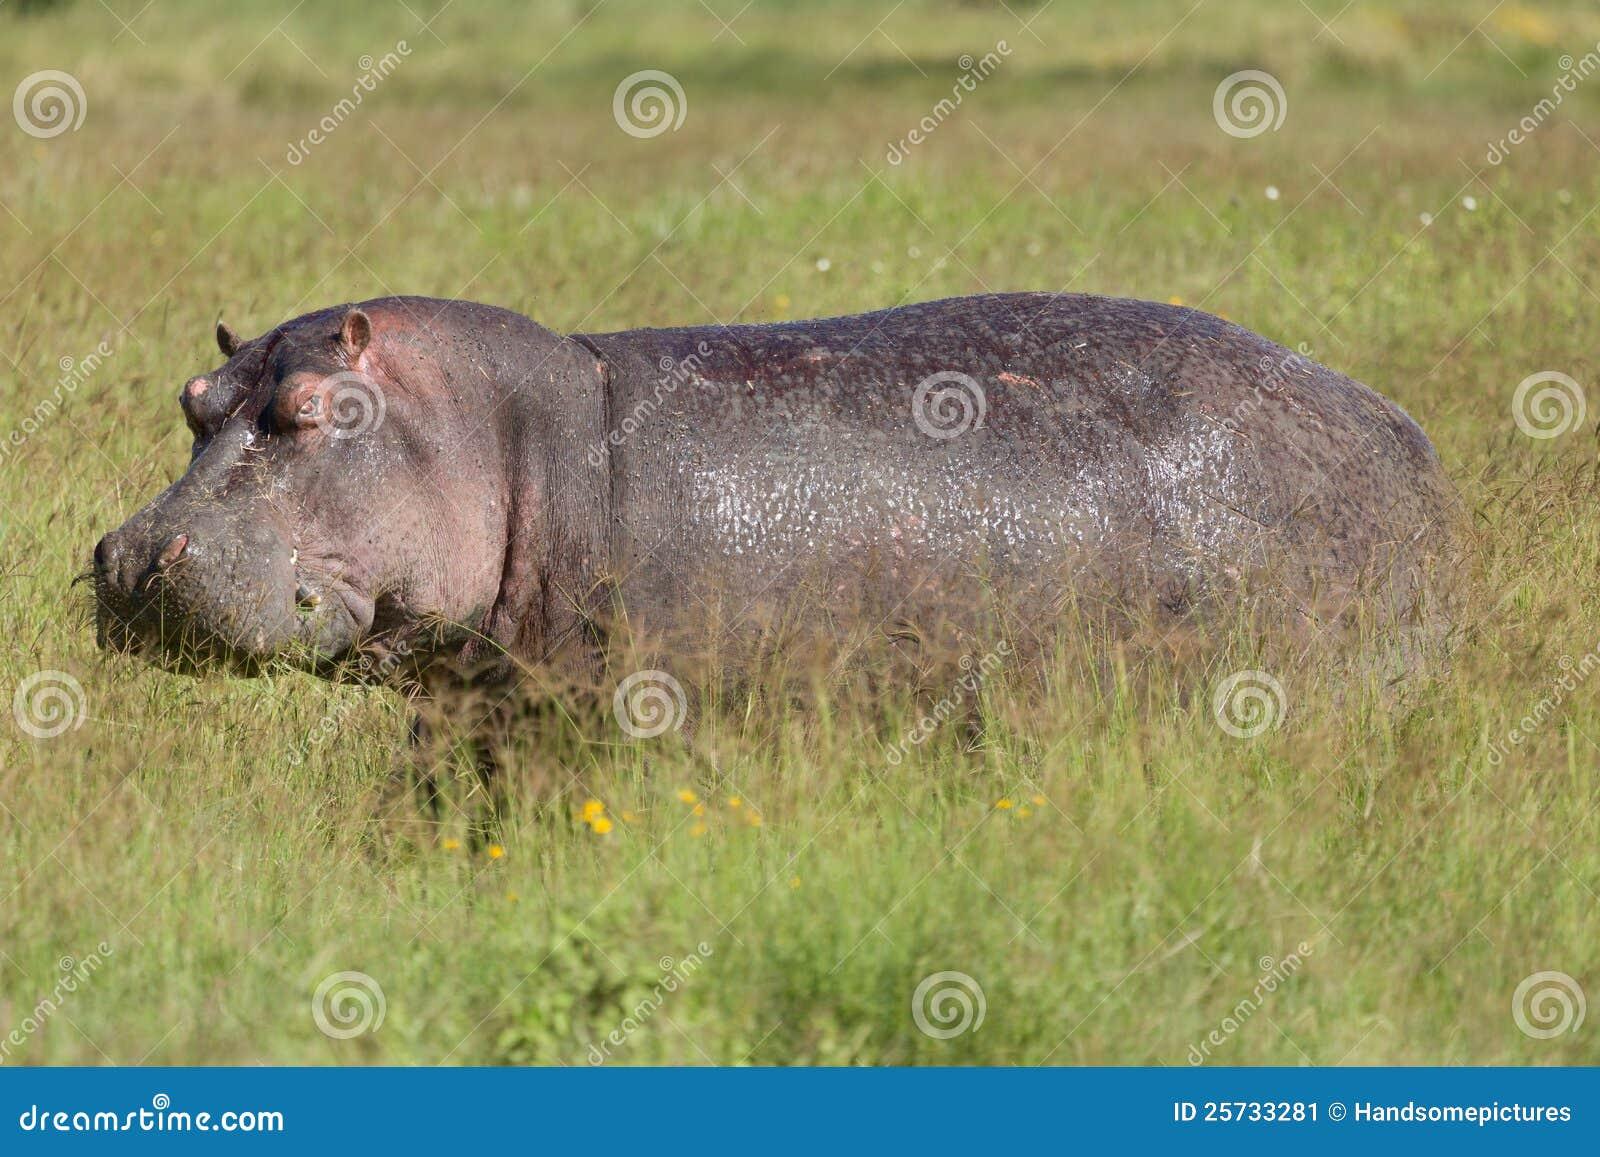 Grazing Hippo